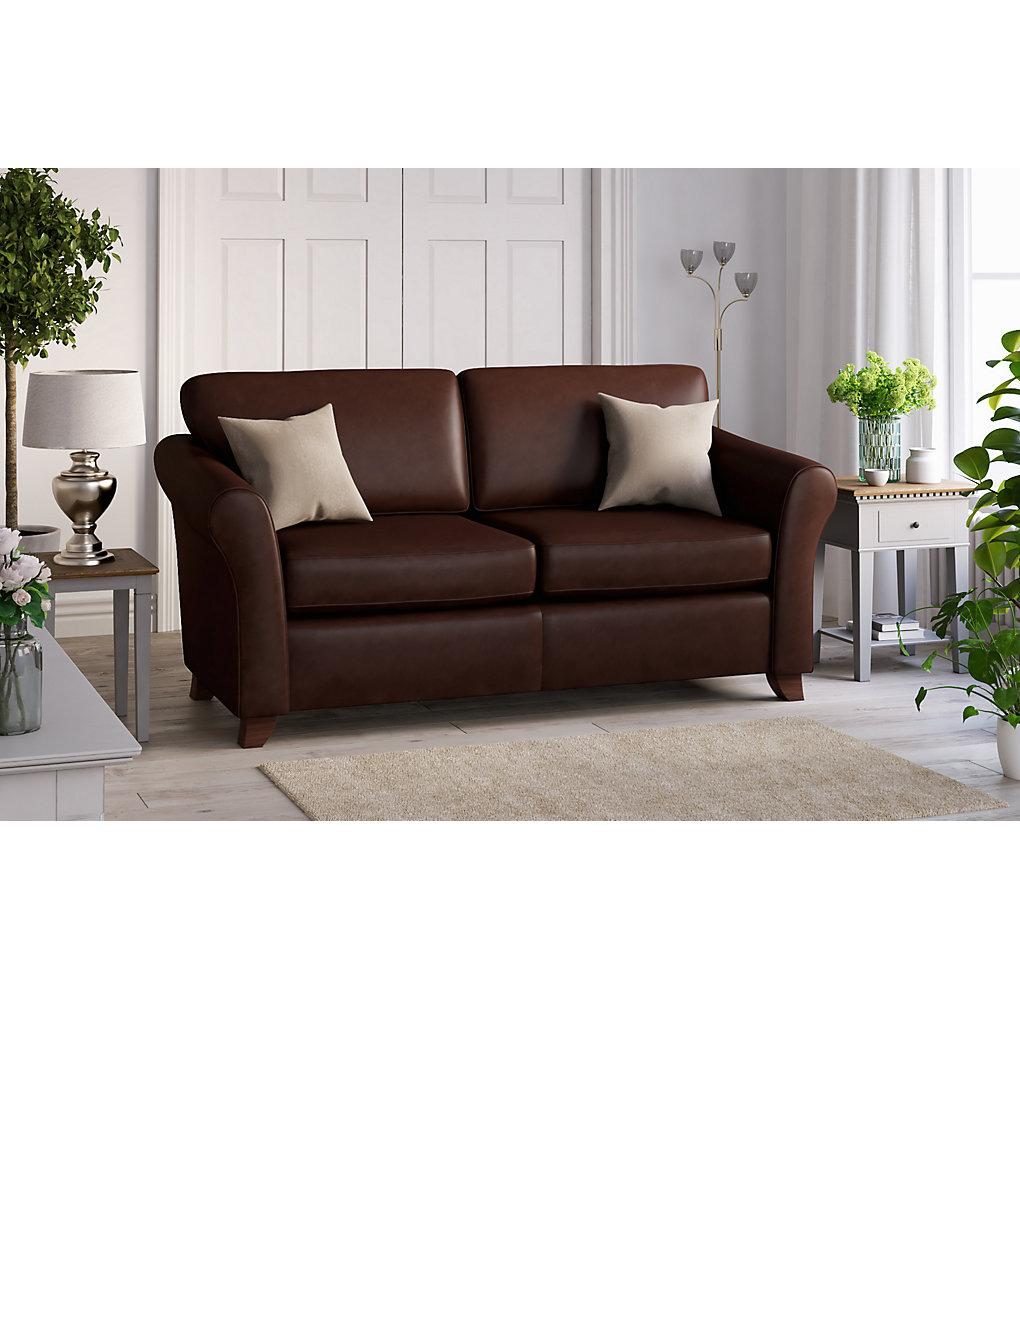 High back sofas ireland for Furniture ireland